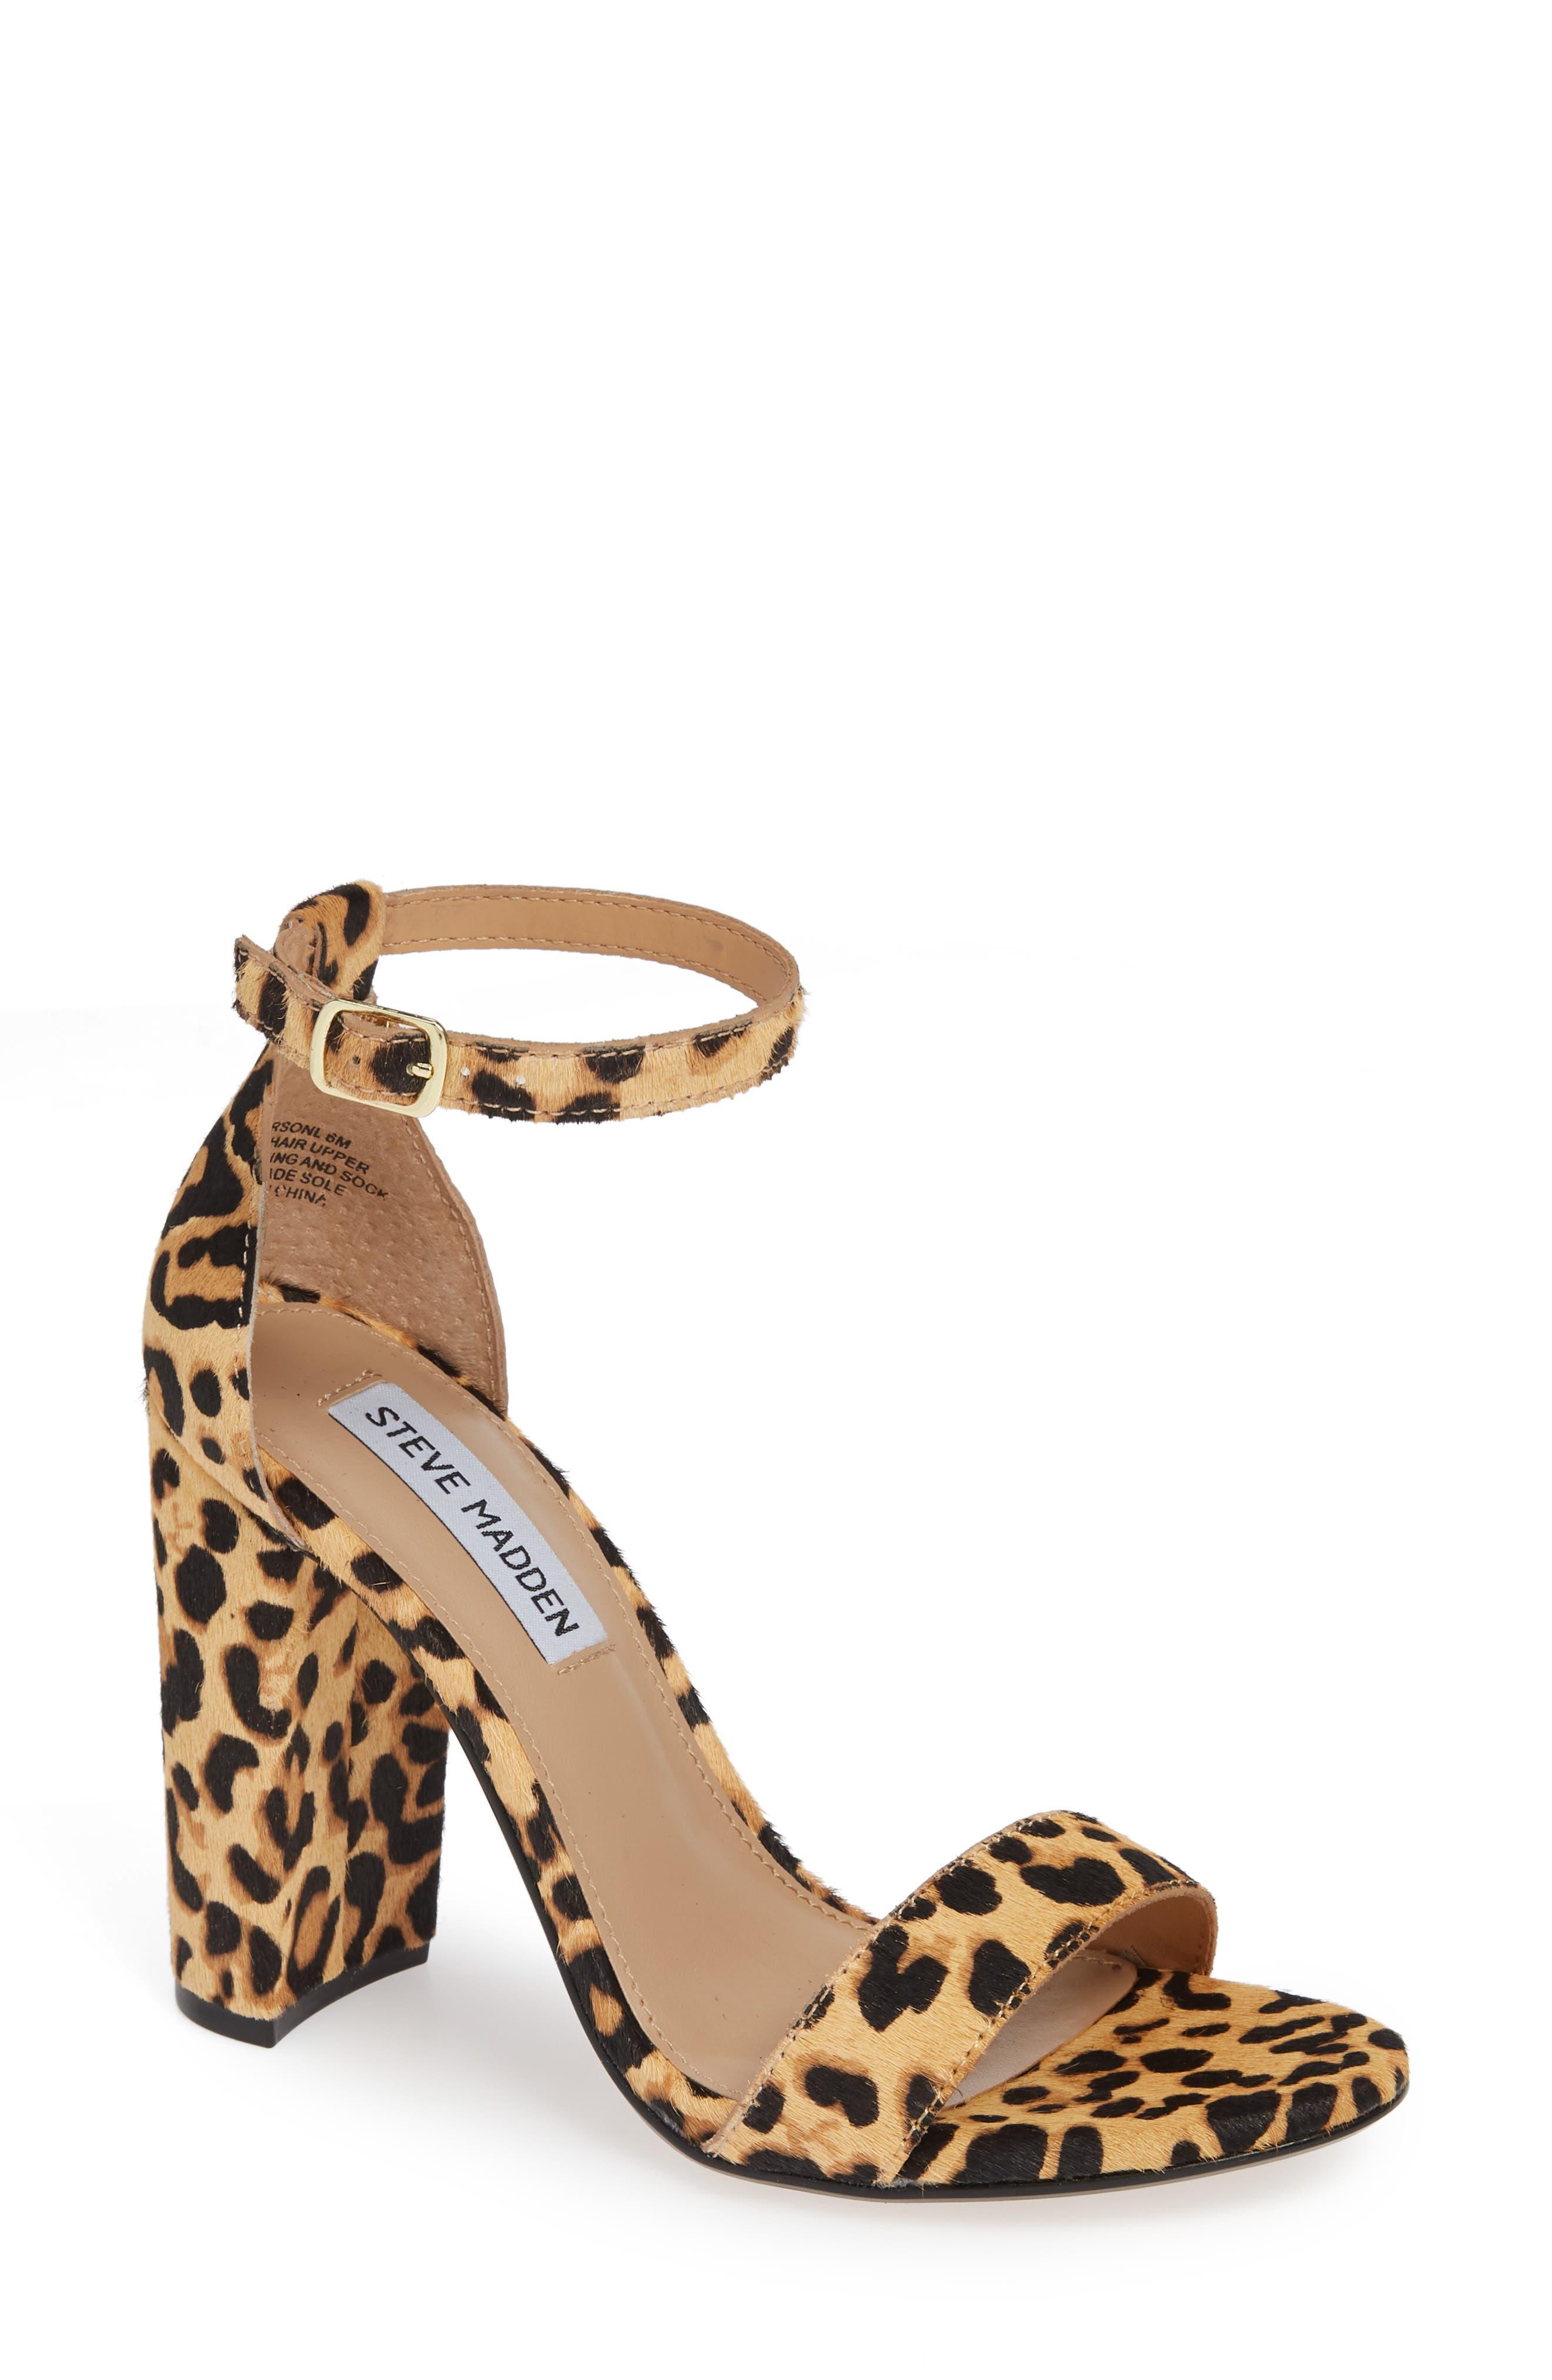 STEVE MADDEN 'Carrson' Sandal, Main, color, LEOPARD MULTI